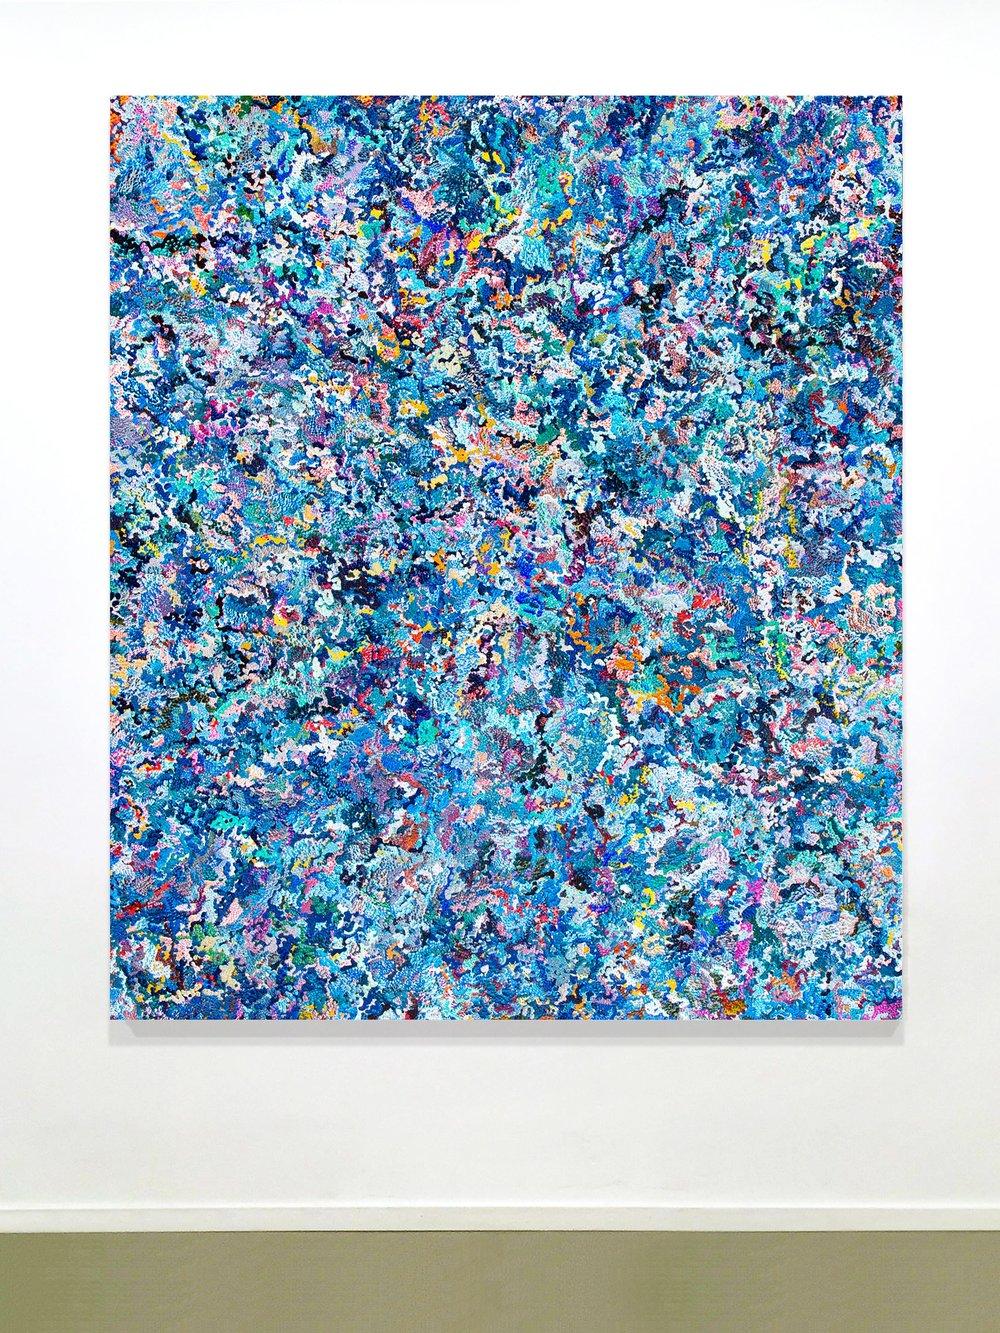 2nd Amalgamation, acrylic on canvas, 2016, 60 x 70in   152 x 178cm